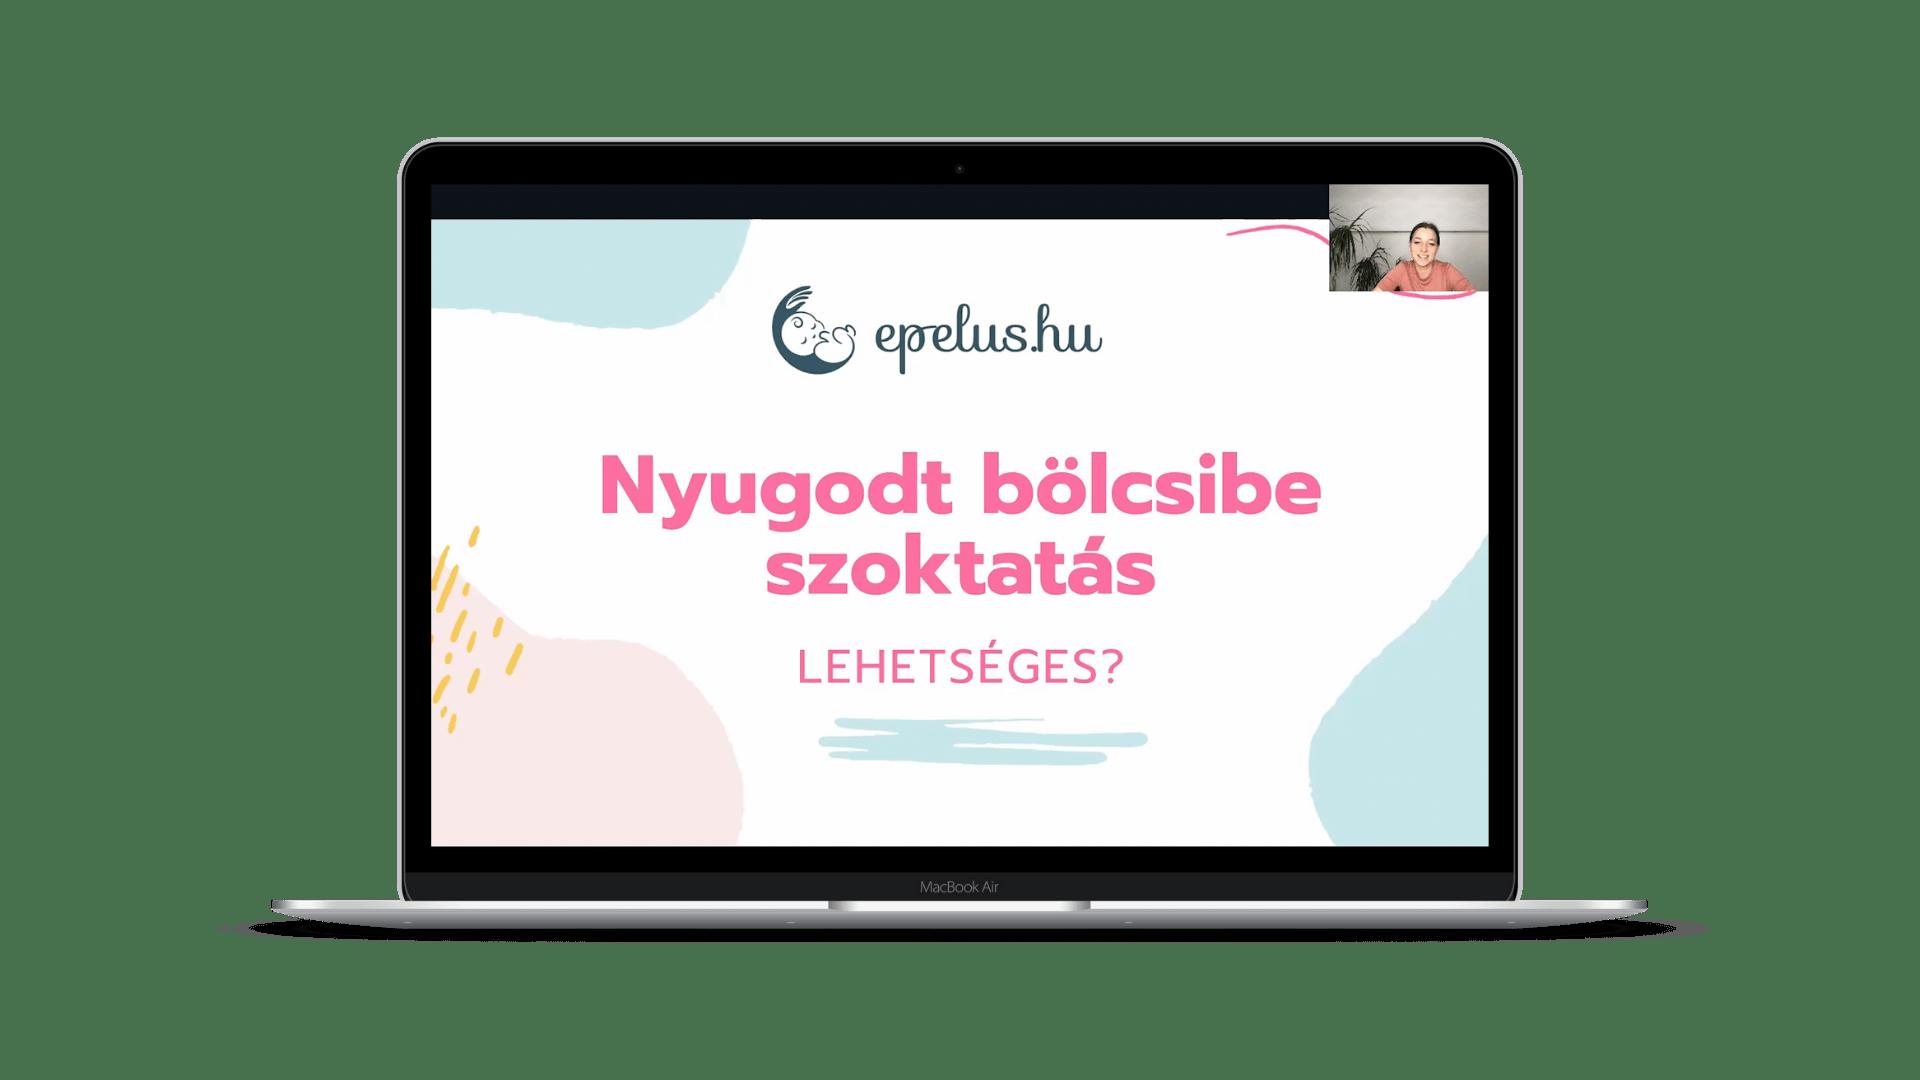 laczko_rita_nyugodt_bolcsibe_szoktatas_folyamata